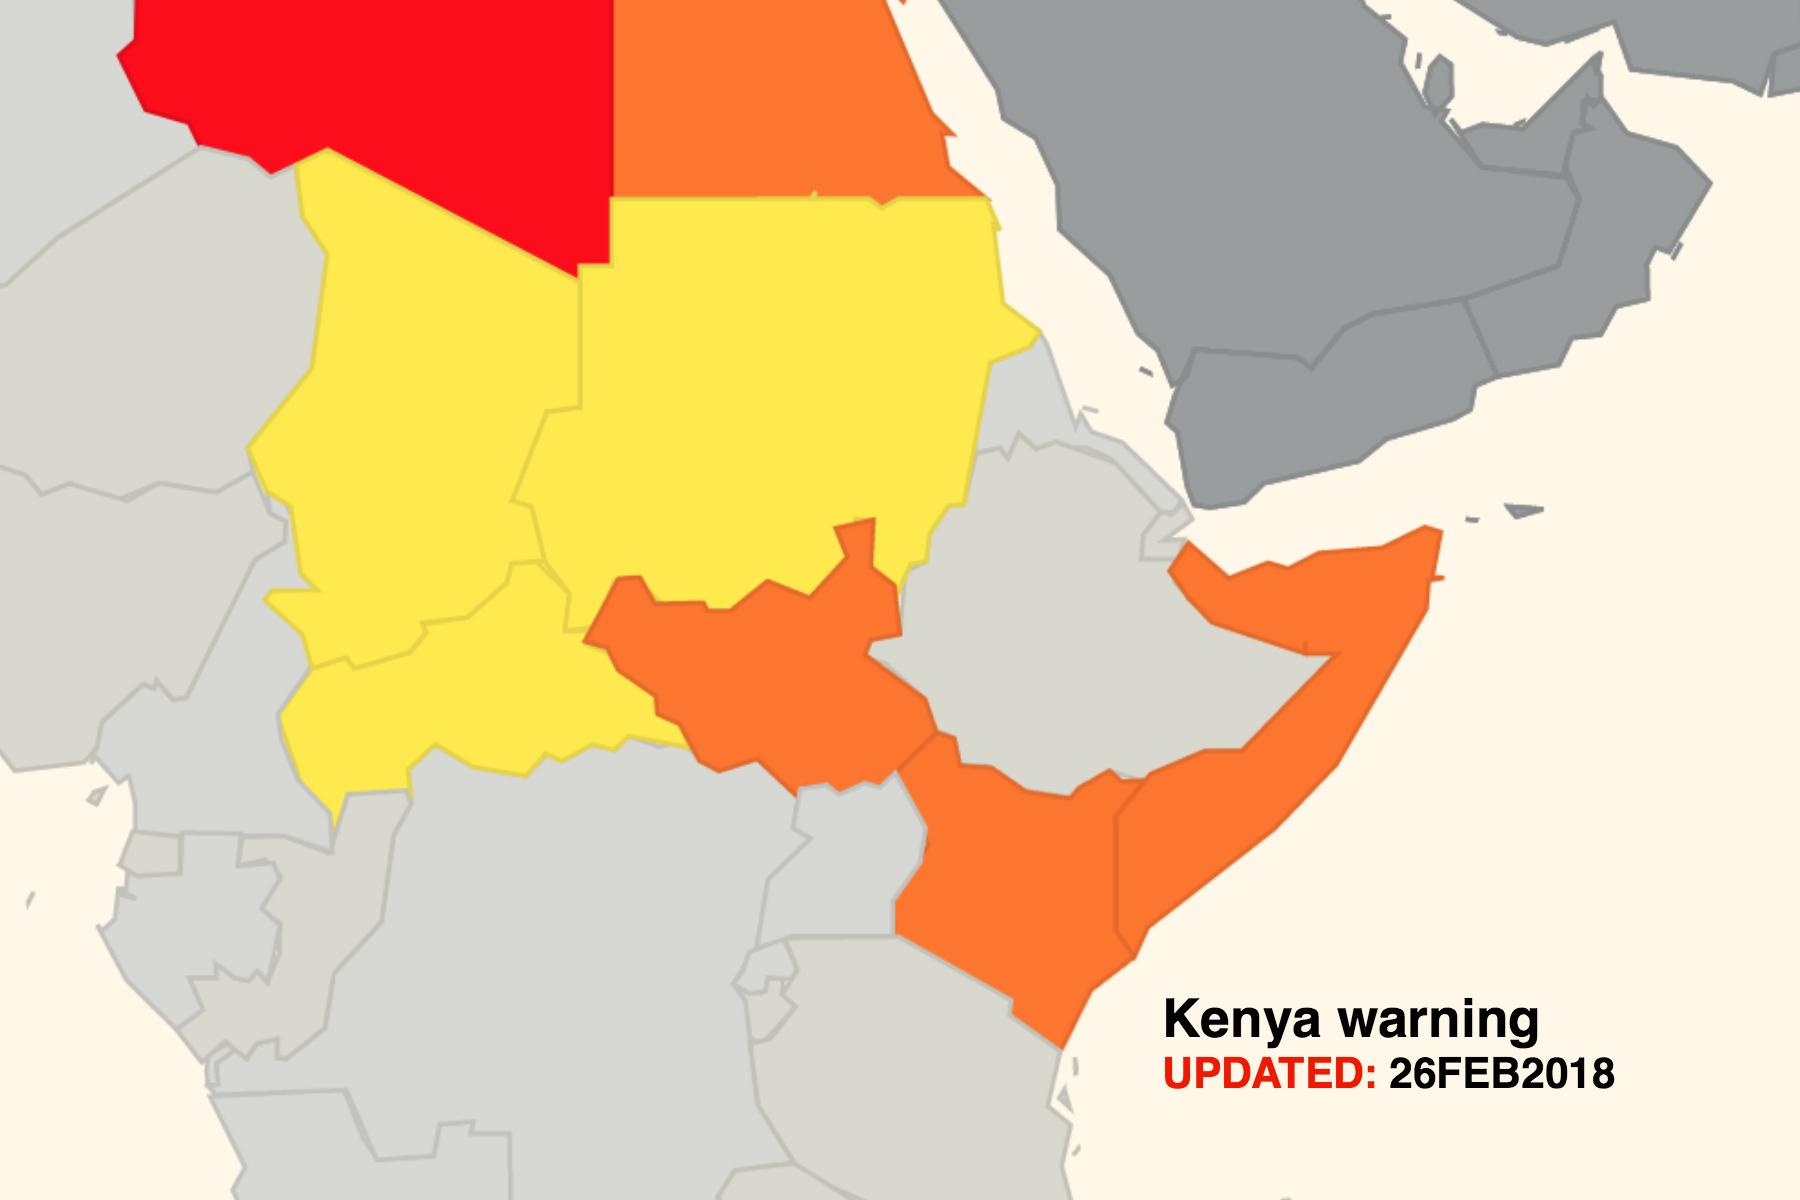 Kenya airspace threat downgraded